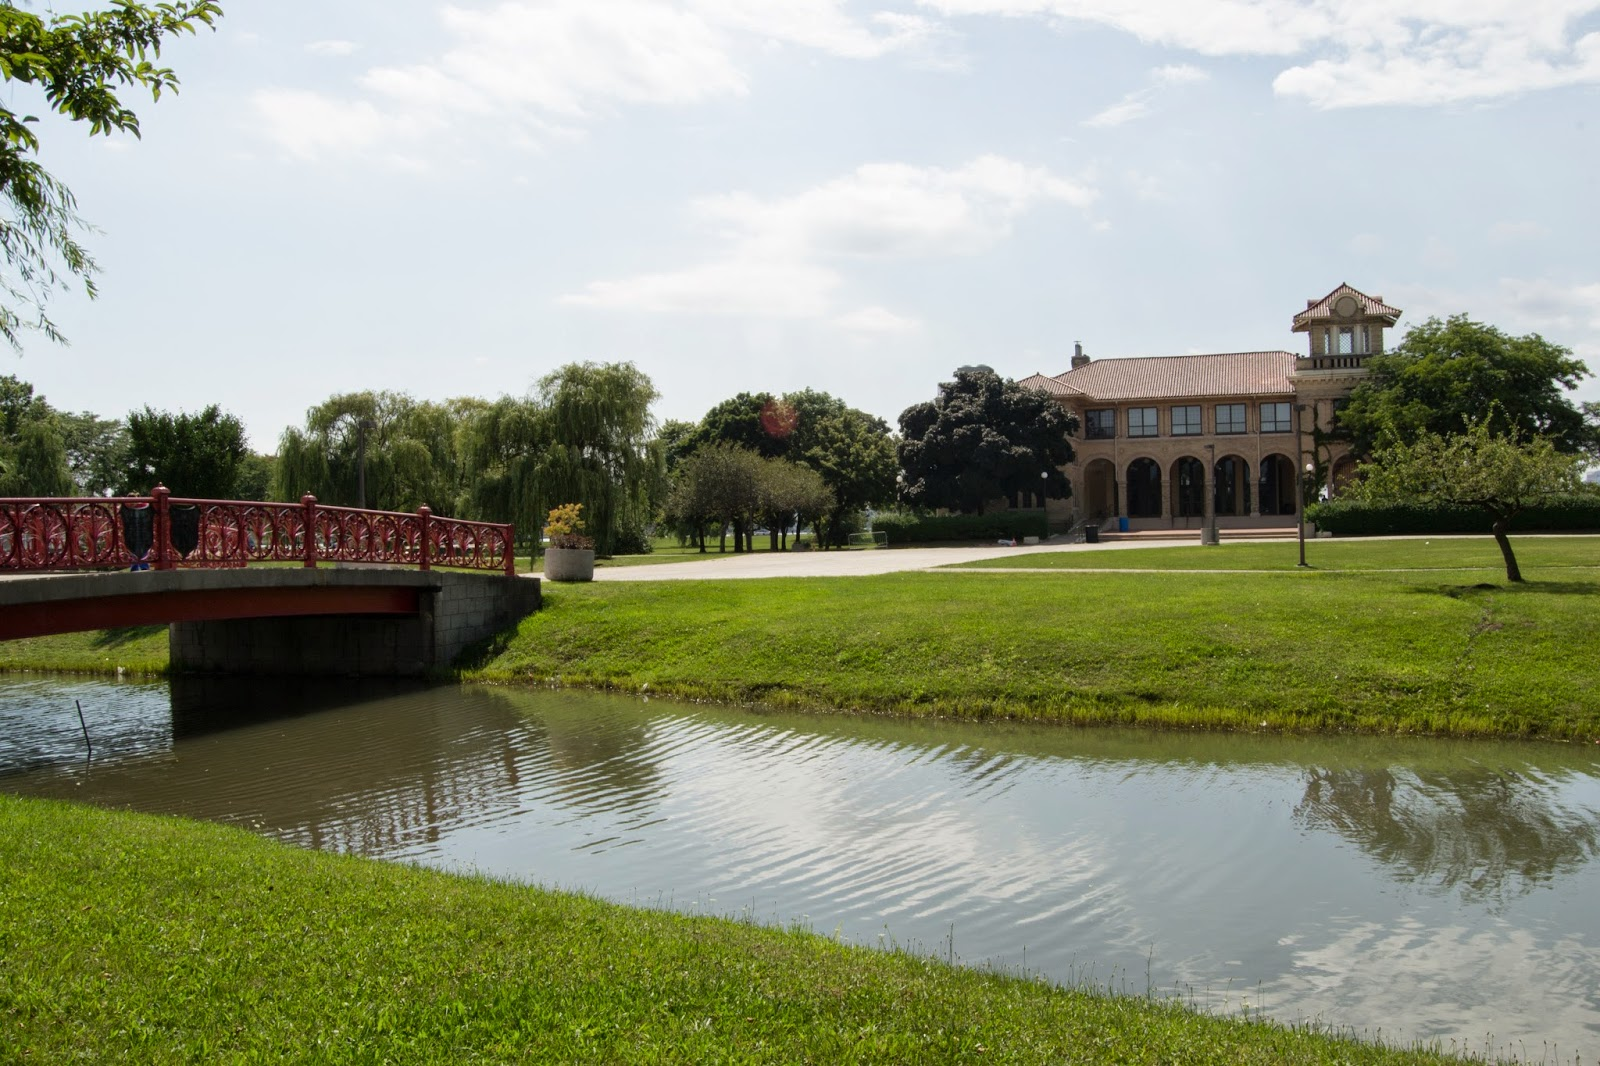 The Casino Belle Isle